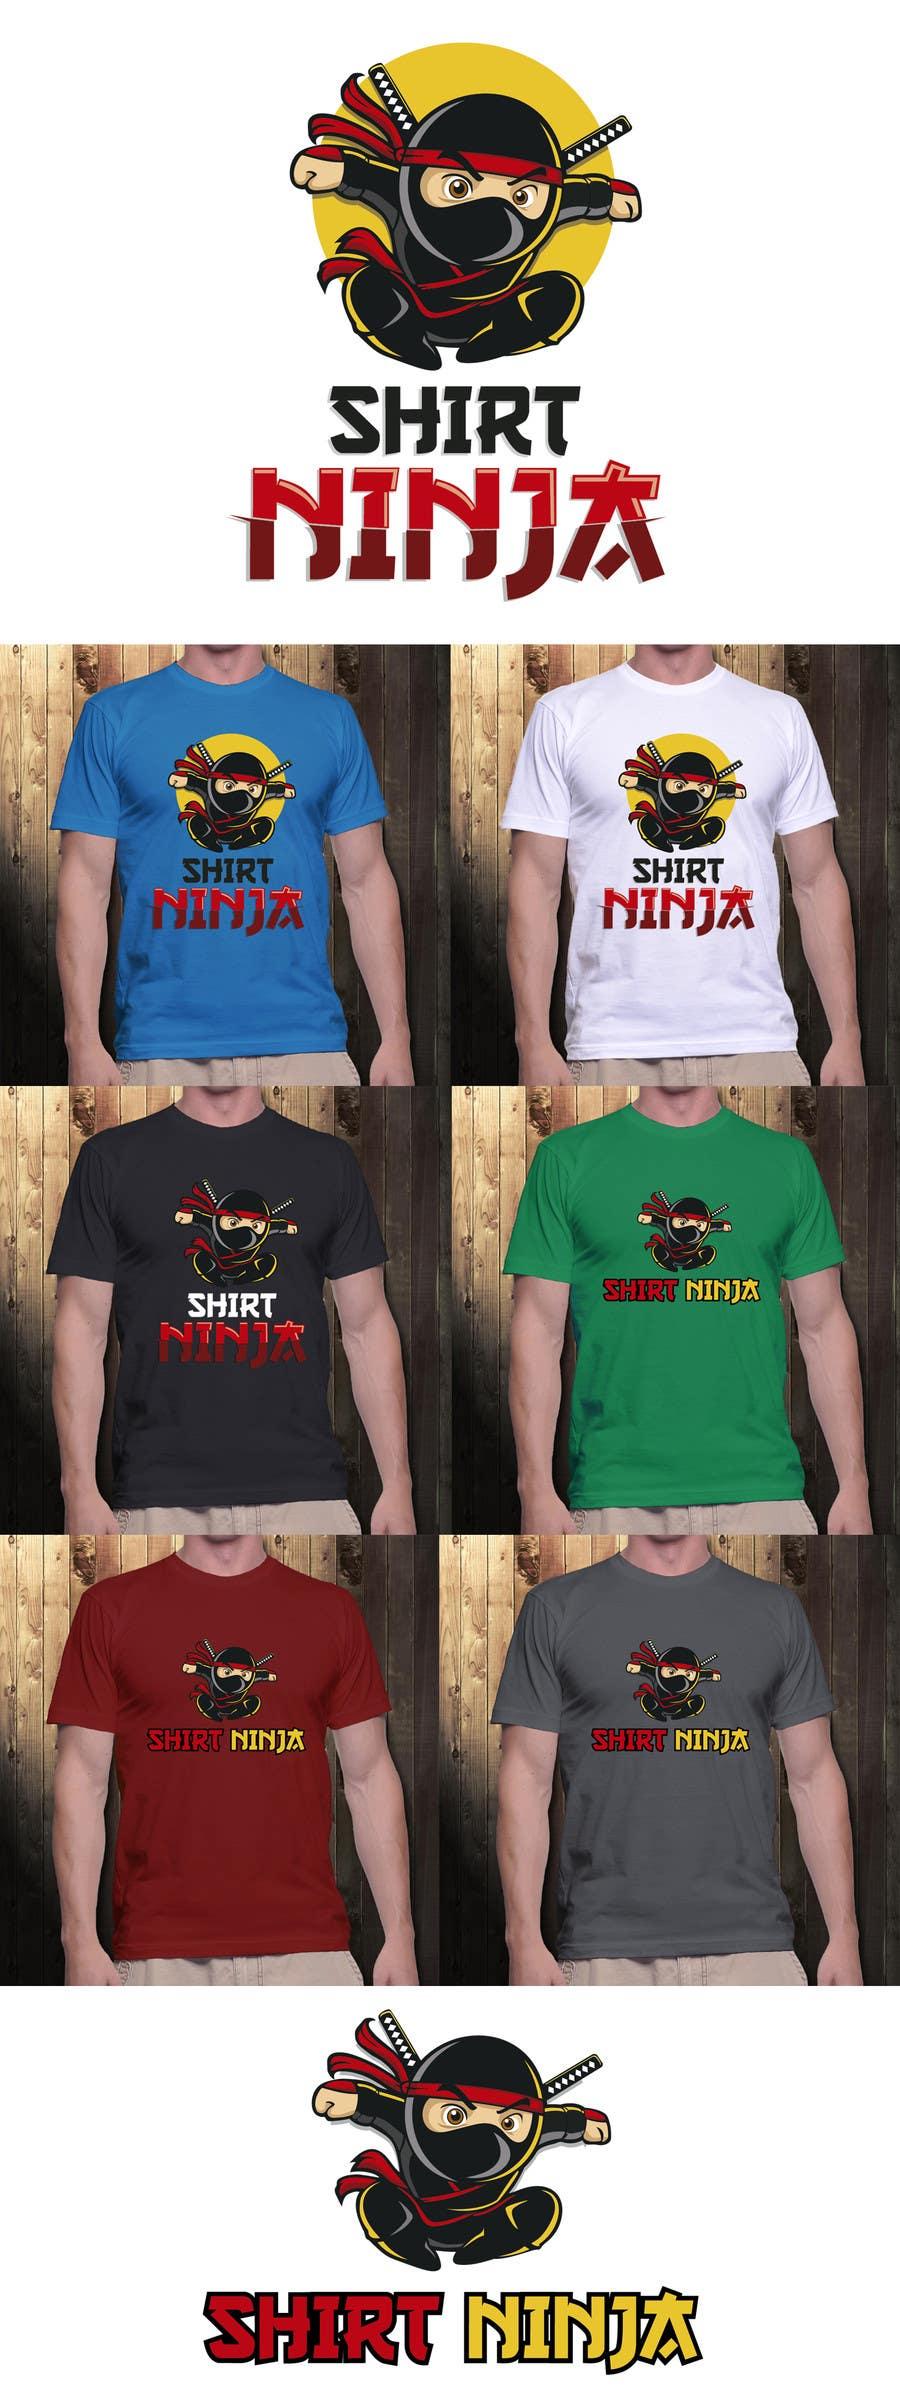 Kilpailutyö #20 kilpailussa Develop SHIRT NINJA logo / brand identity